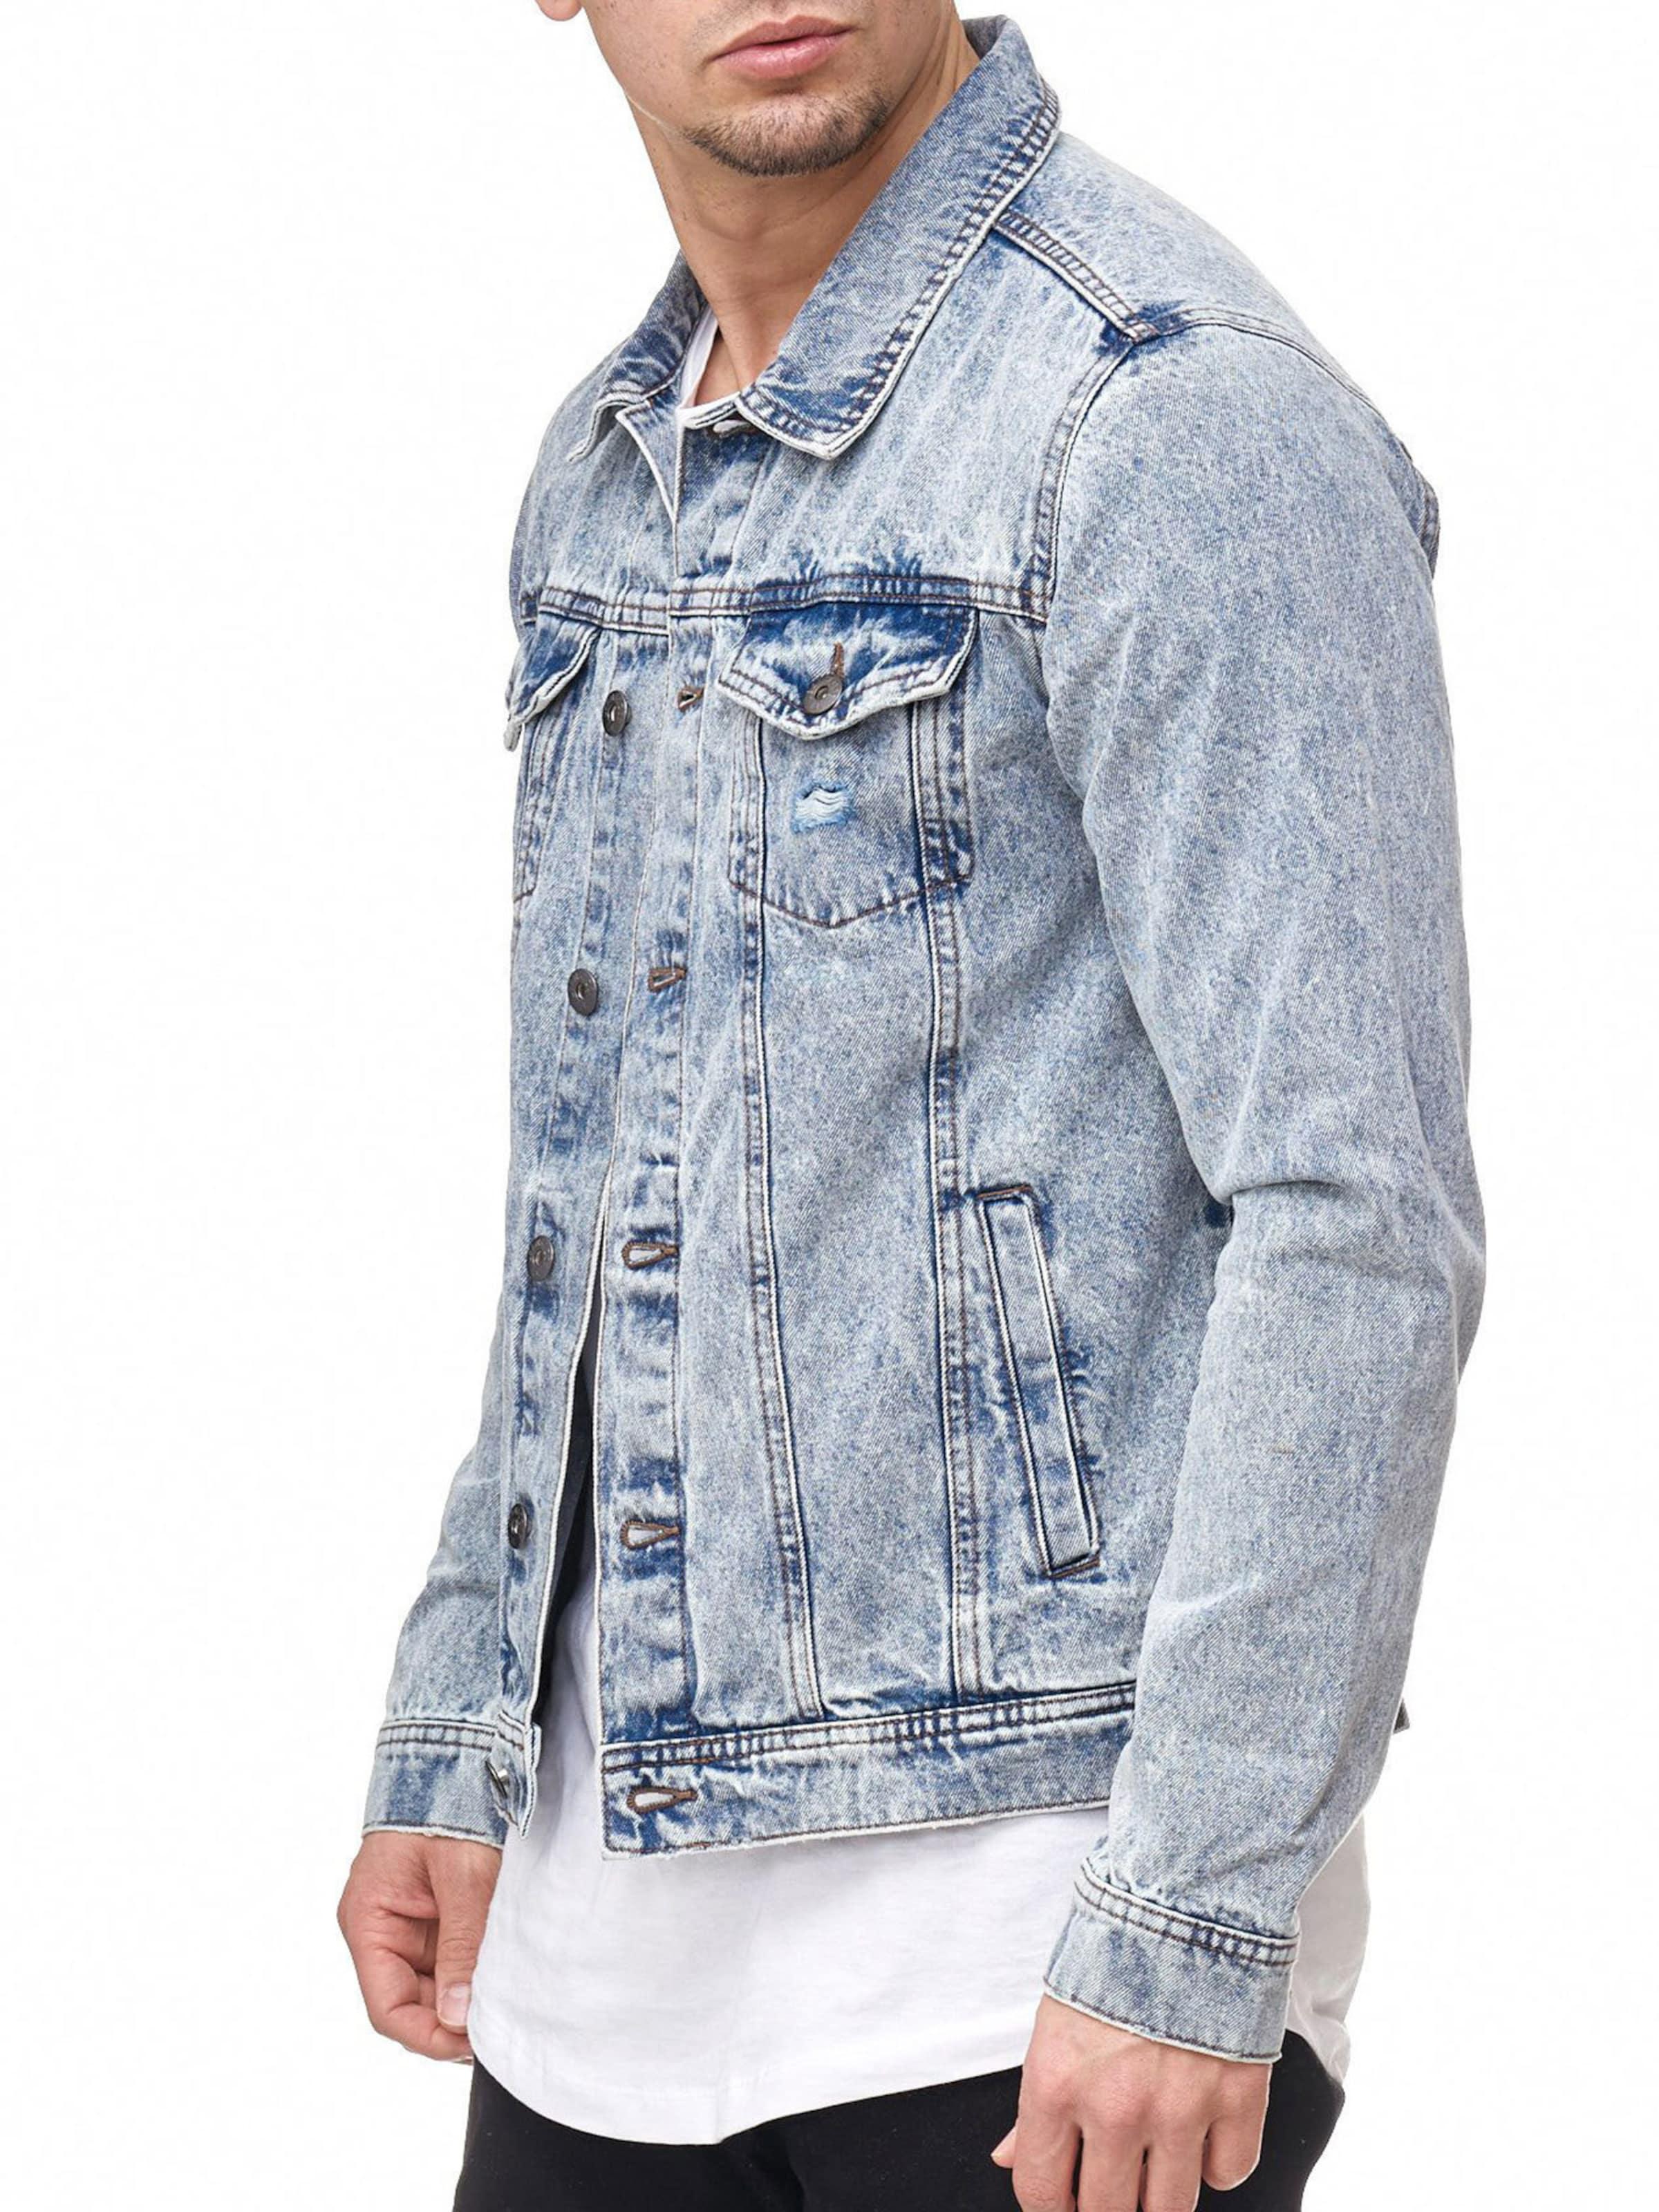 Jeans ' Bryne En Denim Veste Mi Indicode saison Bleu WH2YDIE9